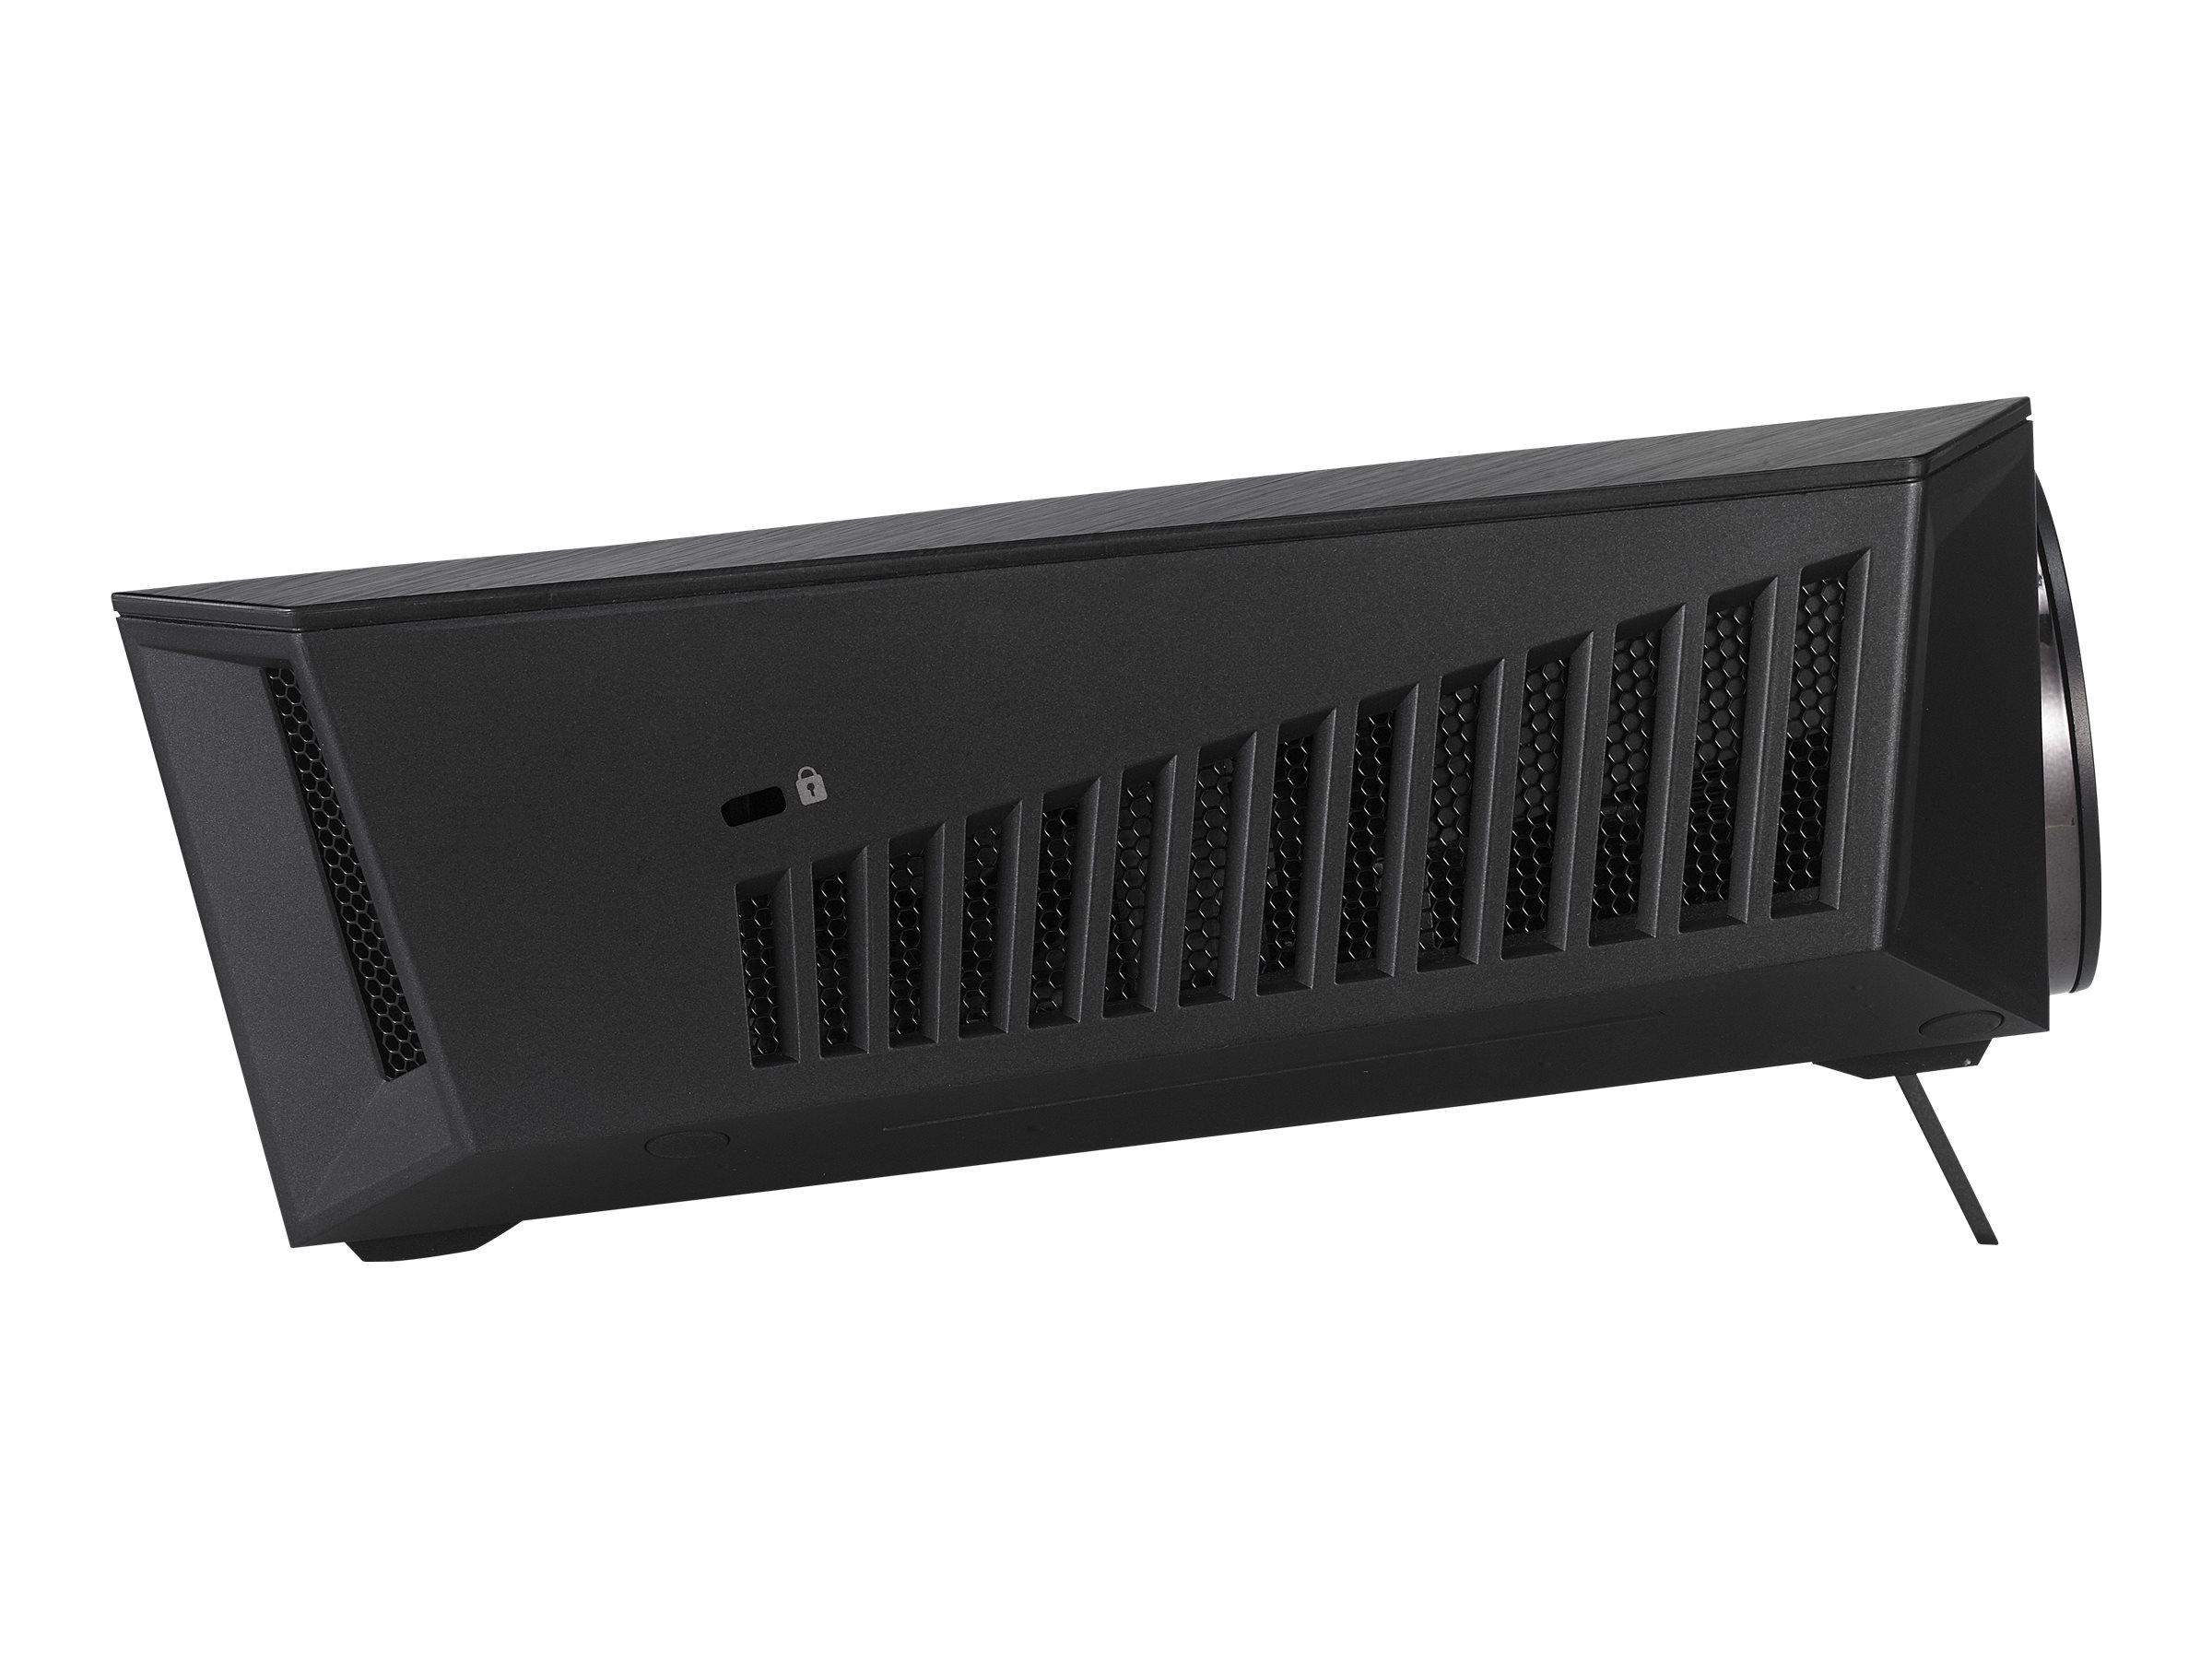 ASUS F1 - DLP projector - short-throw - portable - 3D - IEEE 802.11a/b/g/n wireless - black